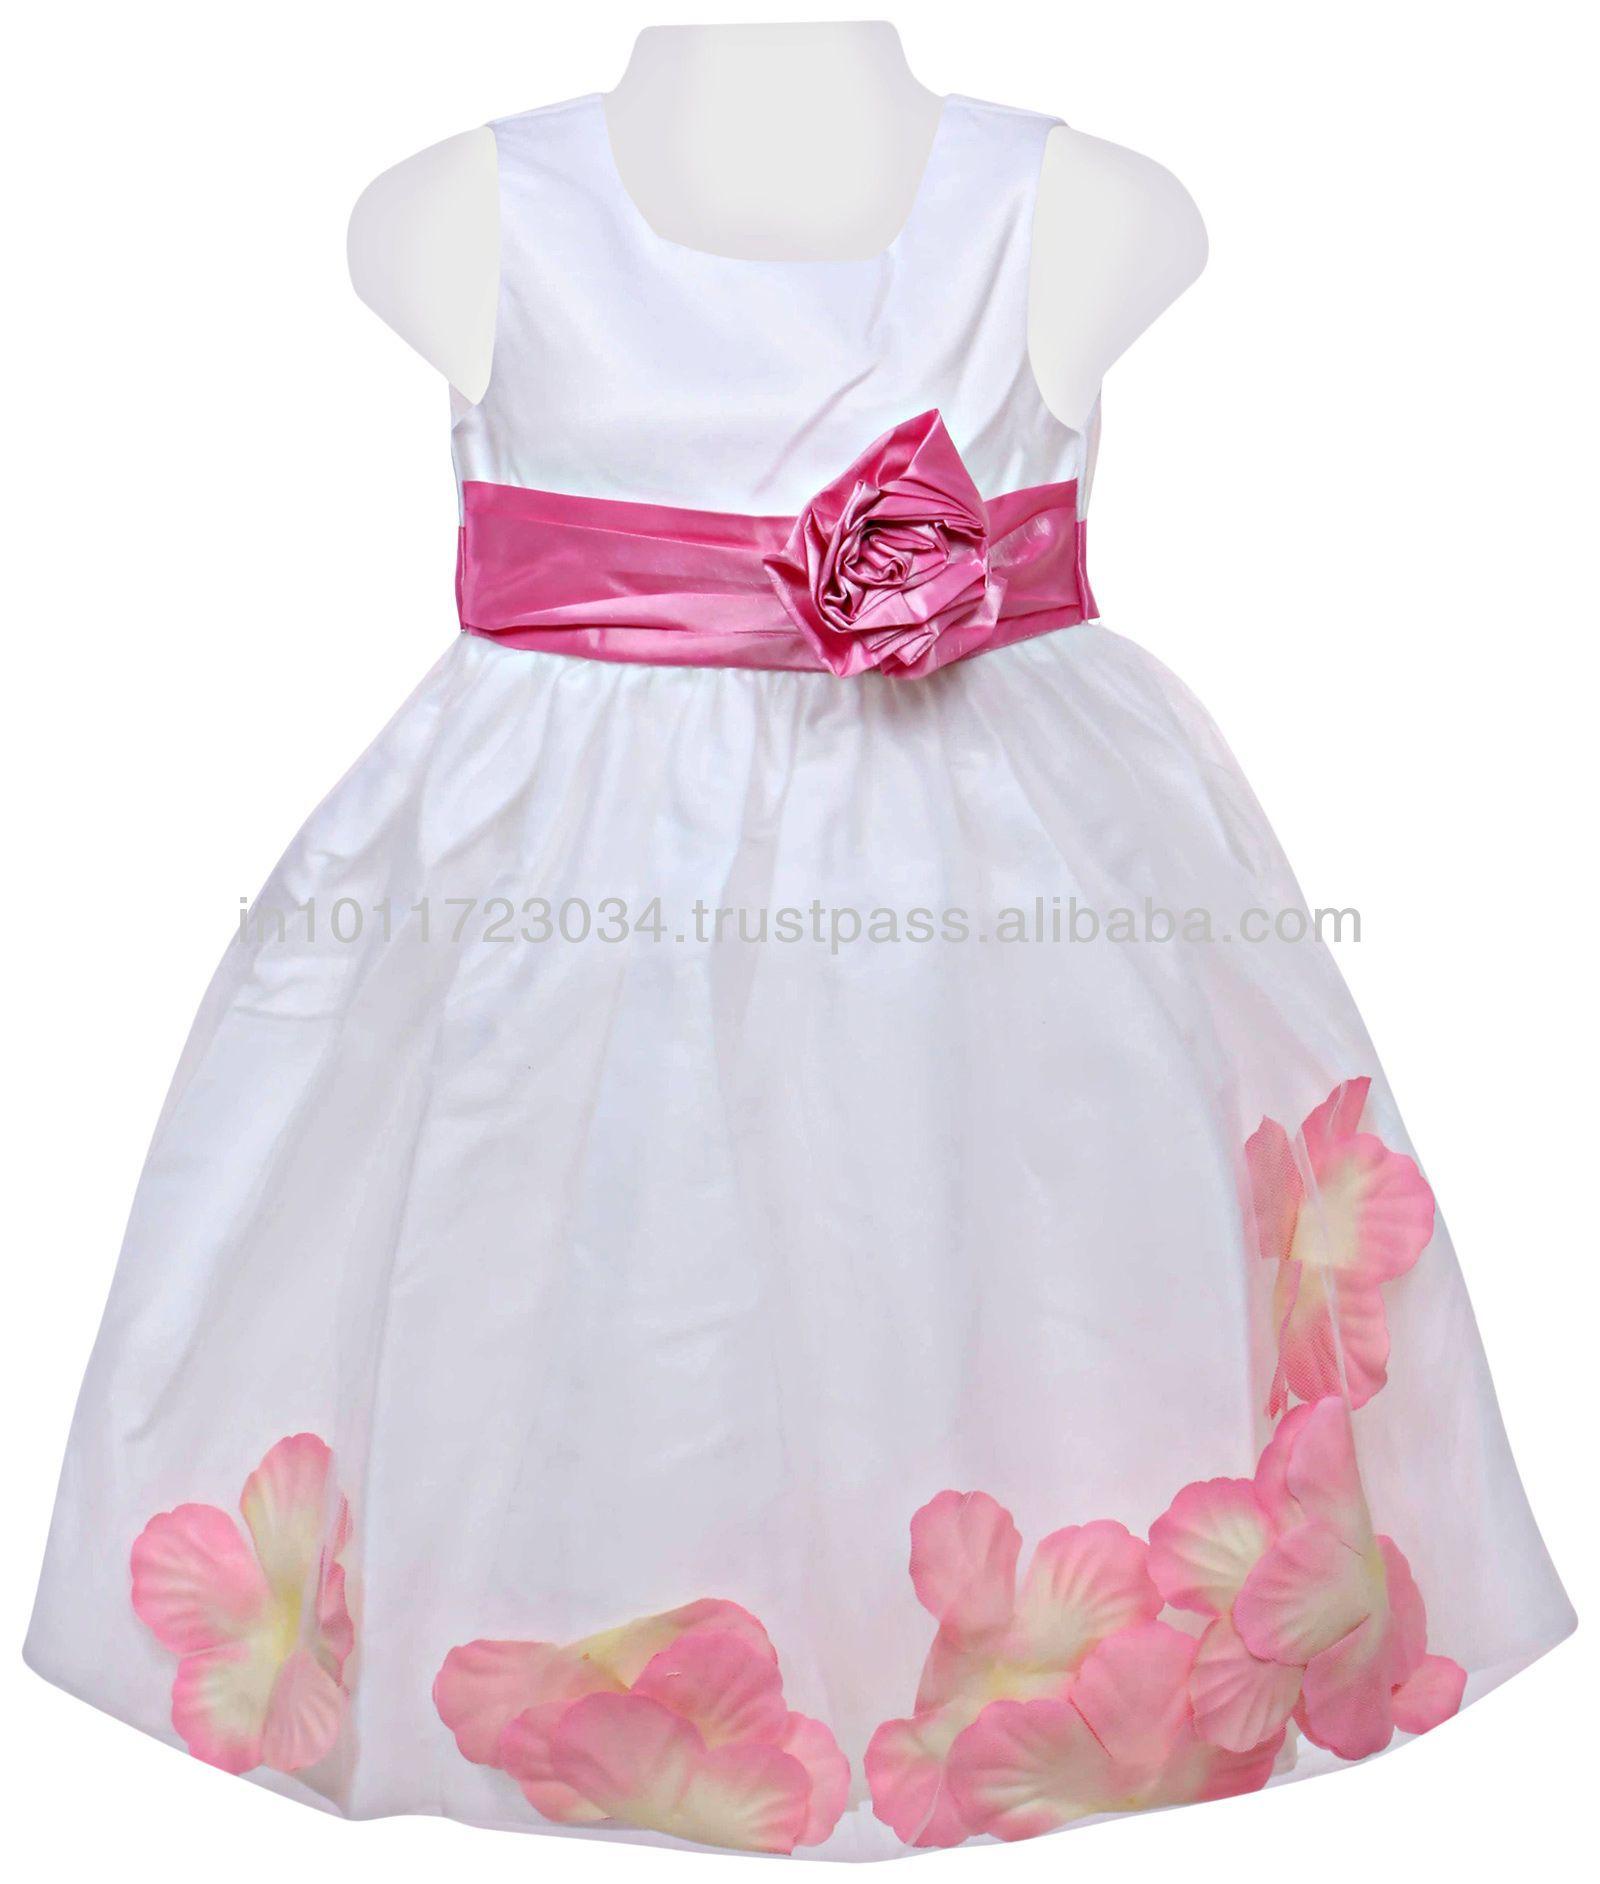 9224ce72e9c42 Popular Hottest Latest Design Baby Frock For Baby - Buy Baby Frock Designs  2013,Latest Children Frocks Designs,Girls Frocks Designs Latest Product on  ...